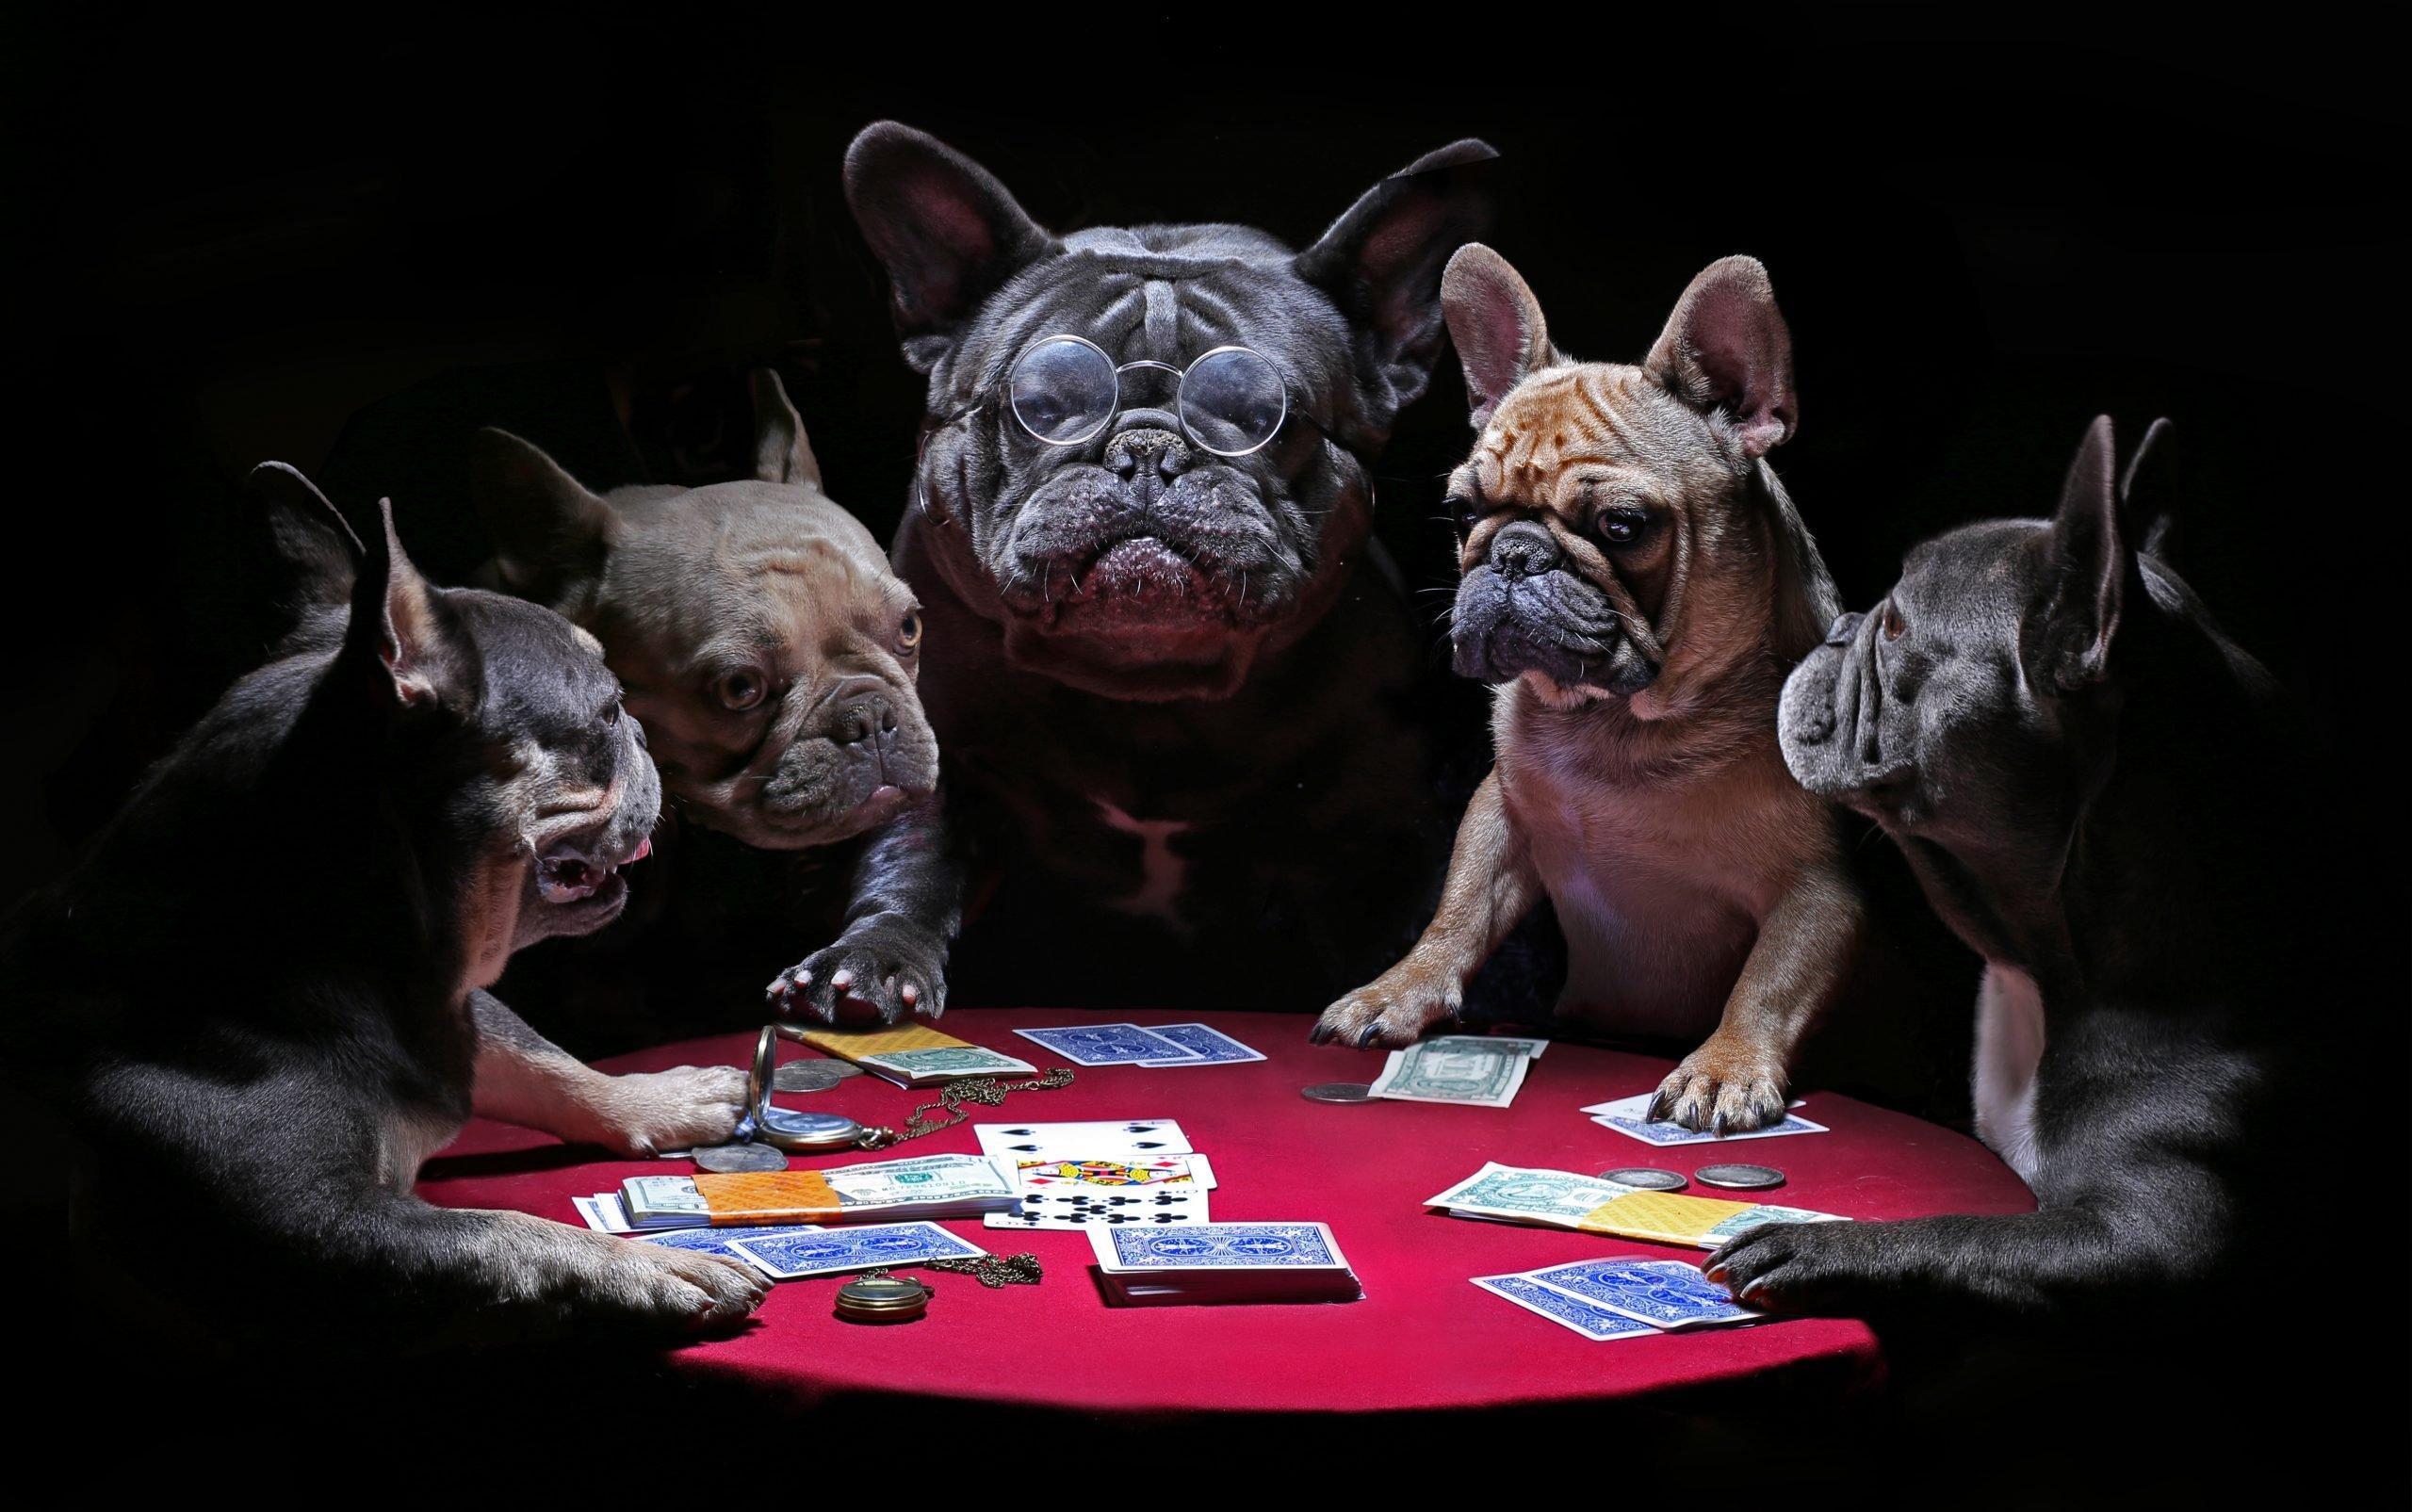 R. Paul Wilson On: A Beautiful Move in Poker